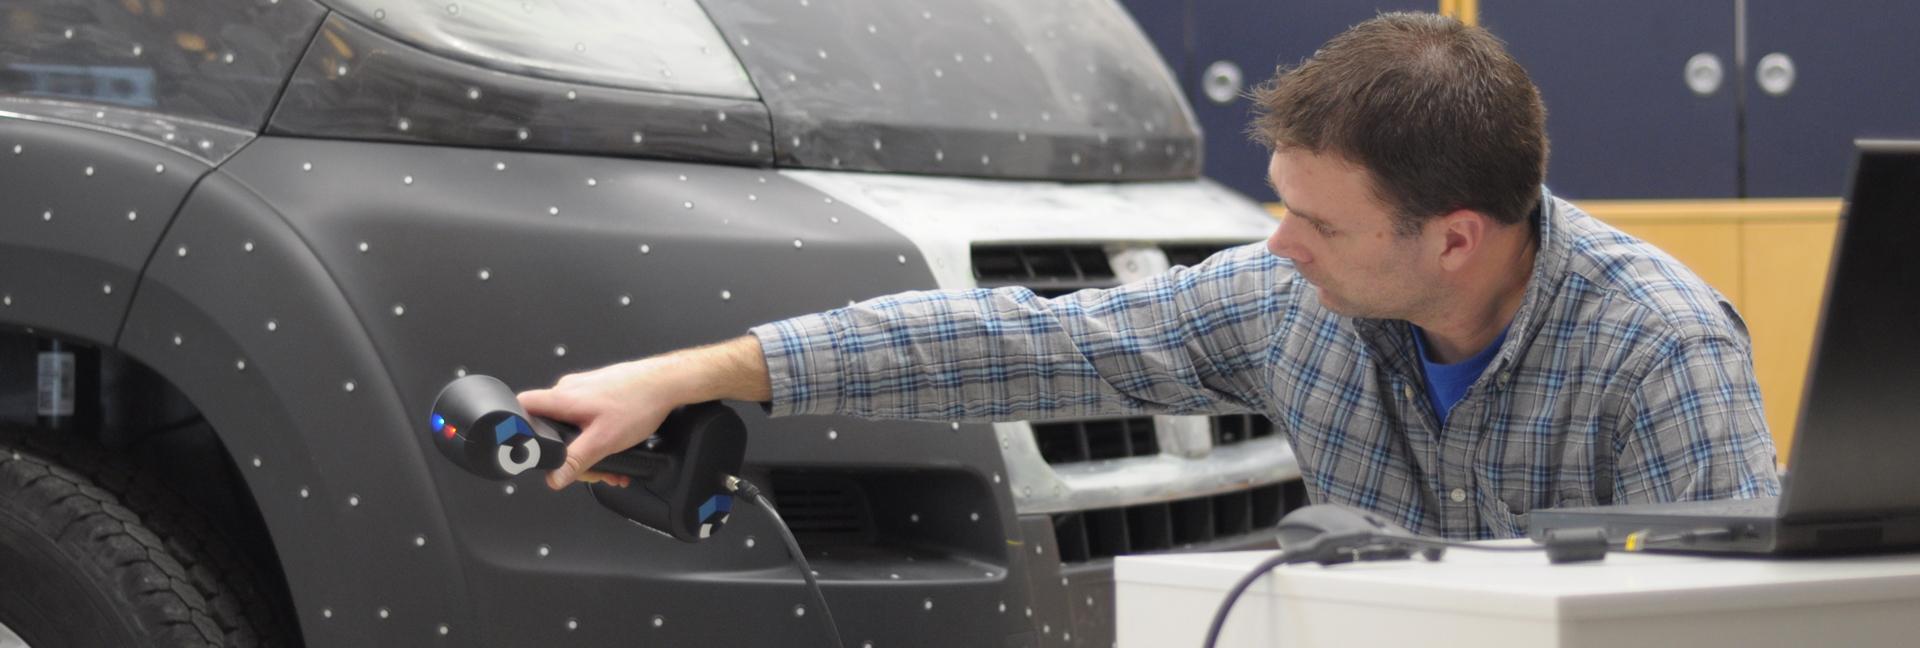 Tangent Design Group, Inc. 3D Scanning An Automotive Exterior